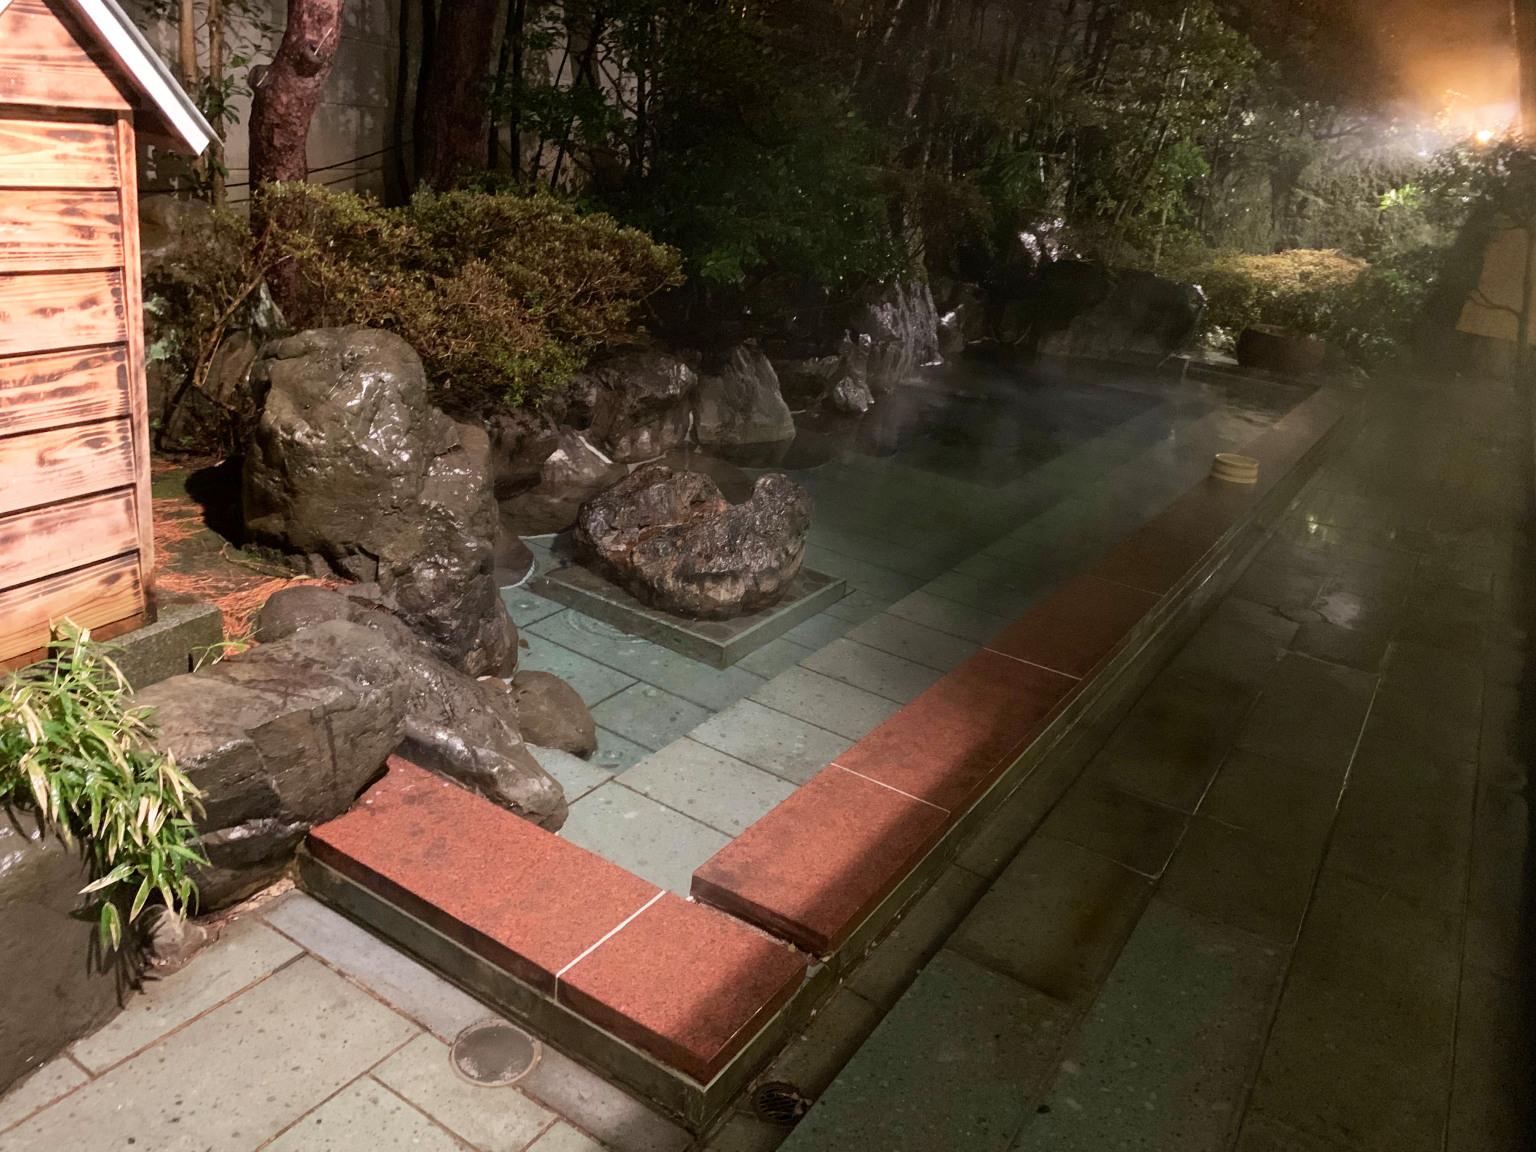 Houshi-Ryokan-onsen-hotel-oldest-in-world-Japan-business-travel-Hoshi-accommodation-stay-photos-reviews-Ishikawa-18.jpg